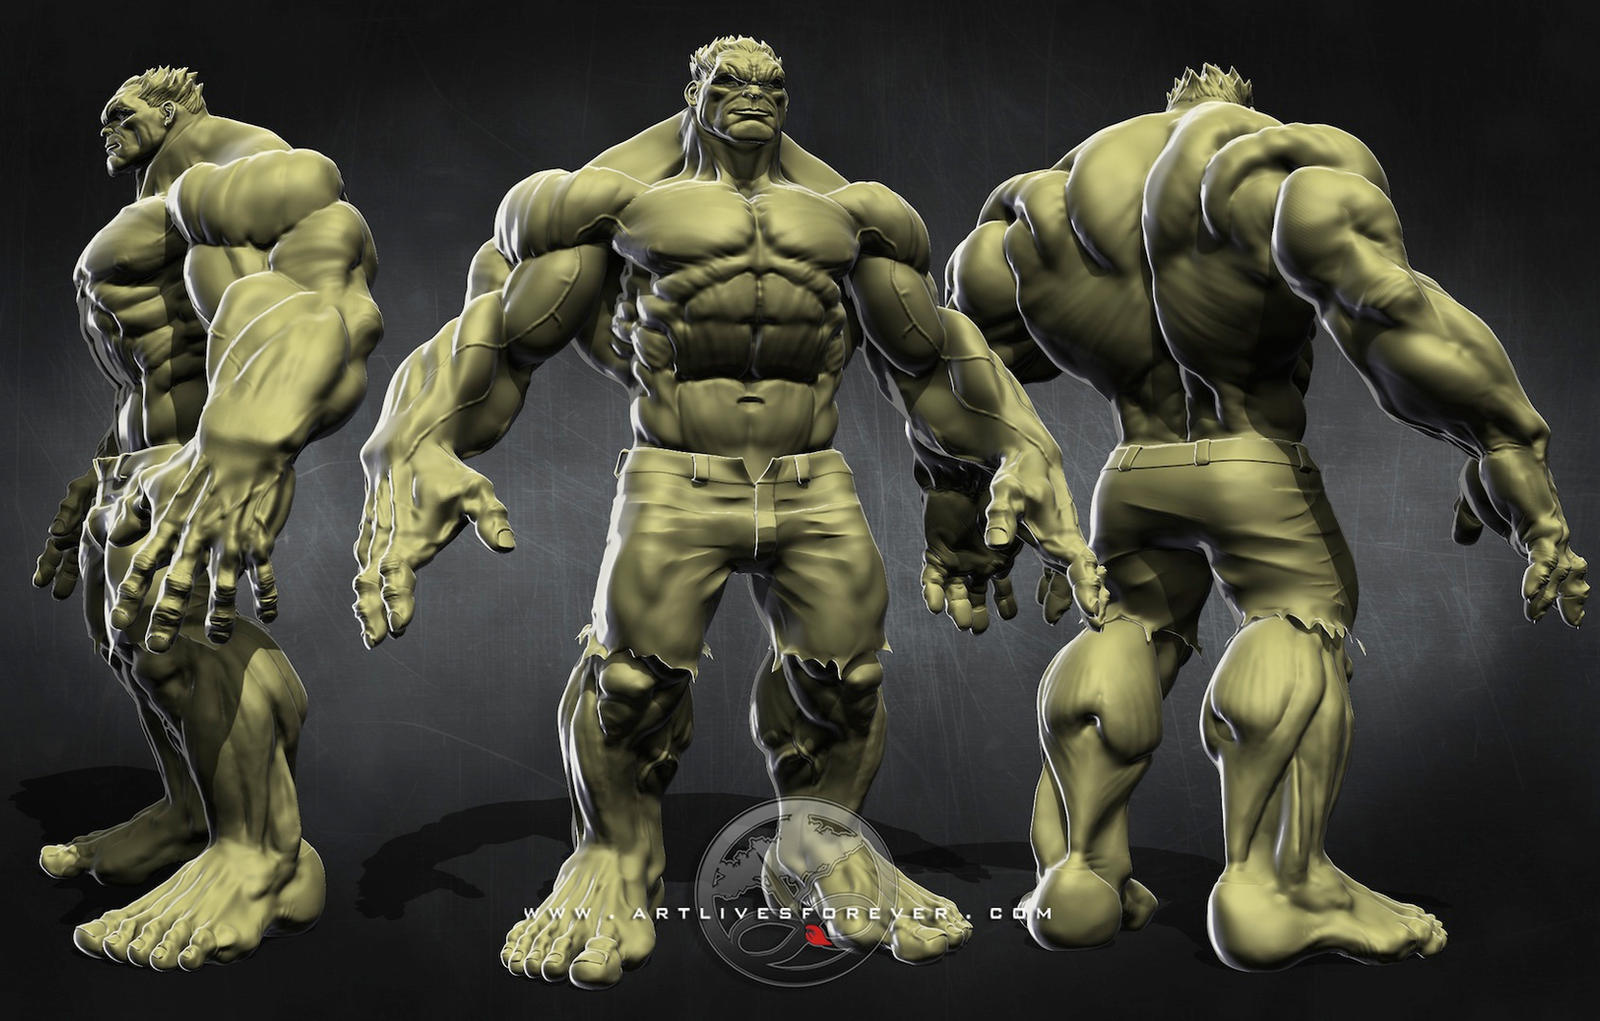 Avengers hulk wallpaper - wallpaper gallery